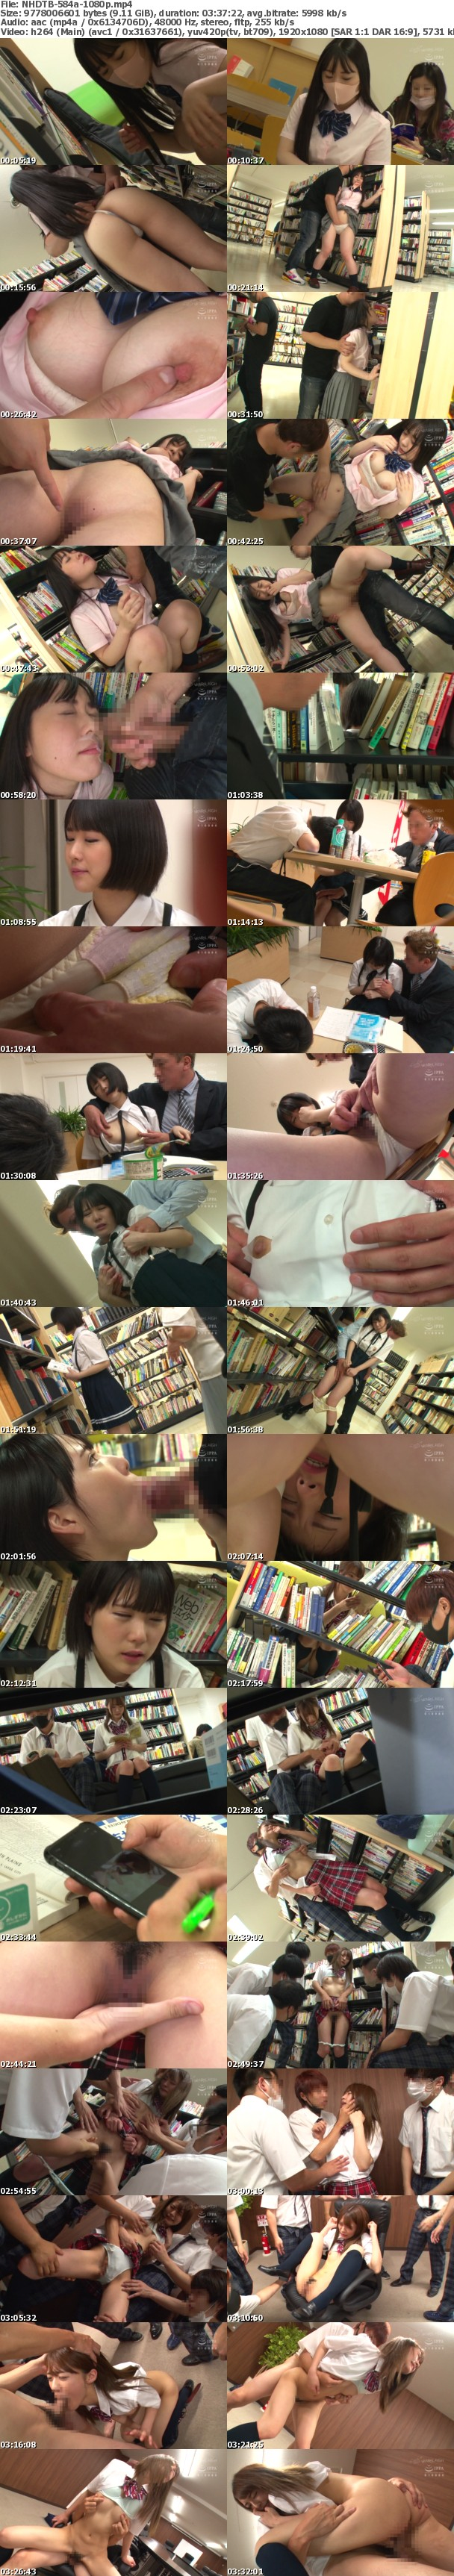 (Full HD) NHDTB-584 図書館で声も出せず糸引くほど愛液が溢れ出す敏感娘25 乳首開発でイキまくる女子○生2枚組SP